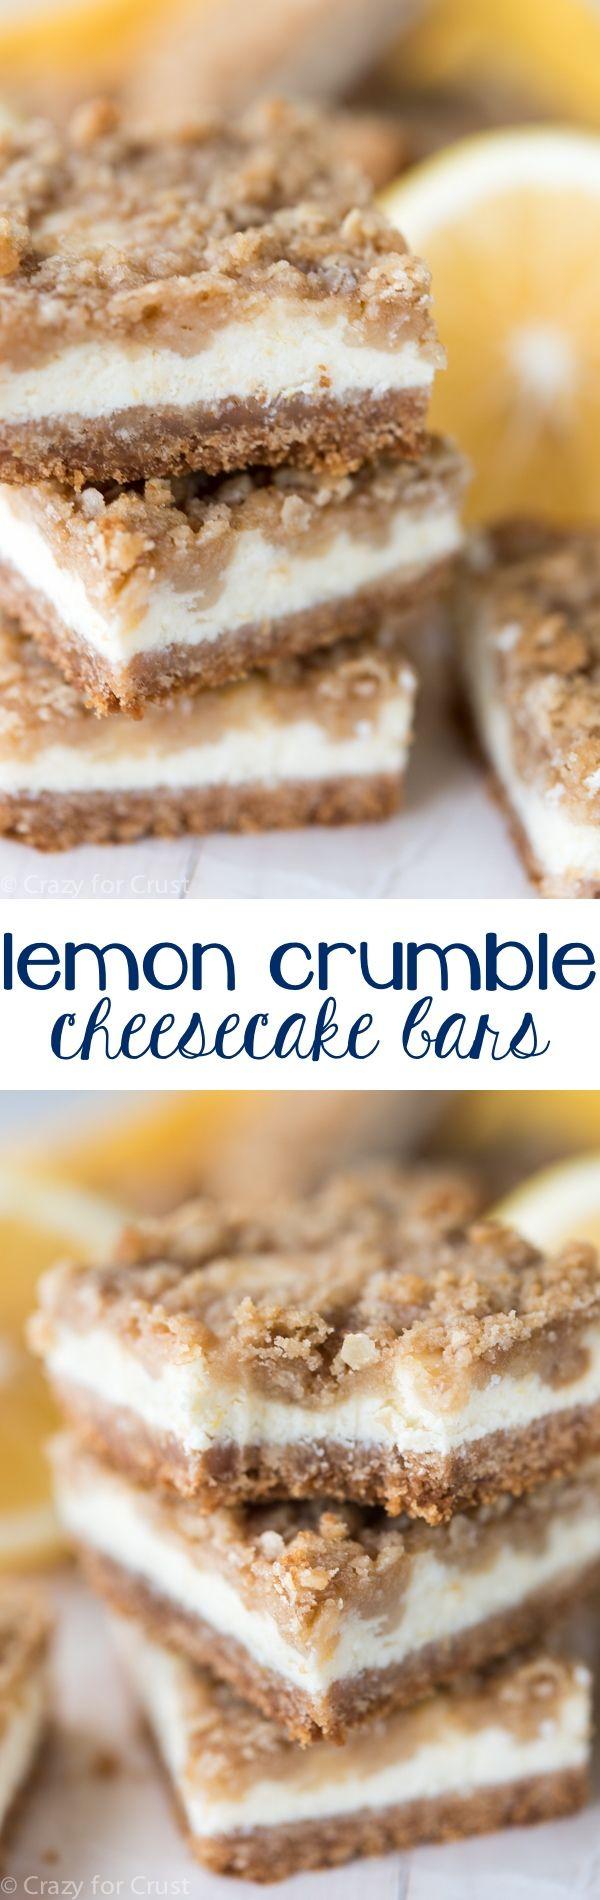 Lemon Crumble Cheesecake Bars